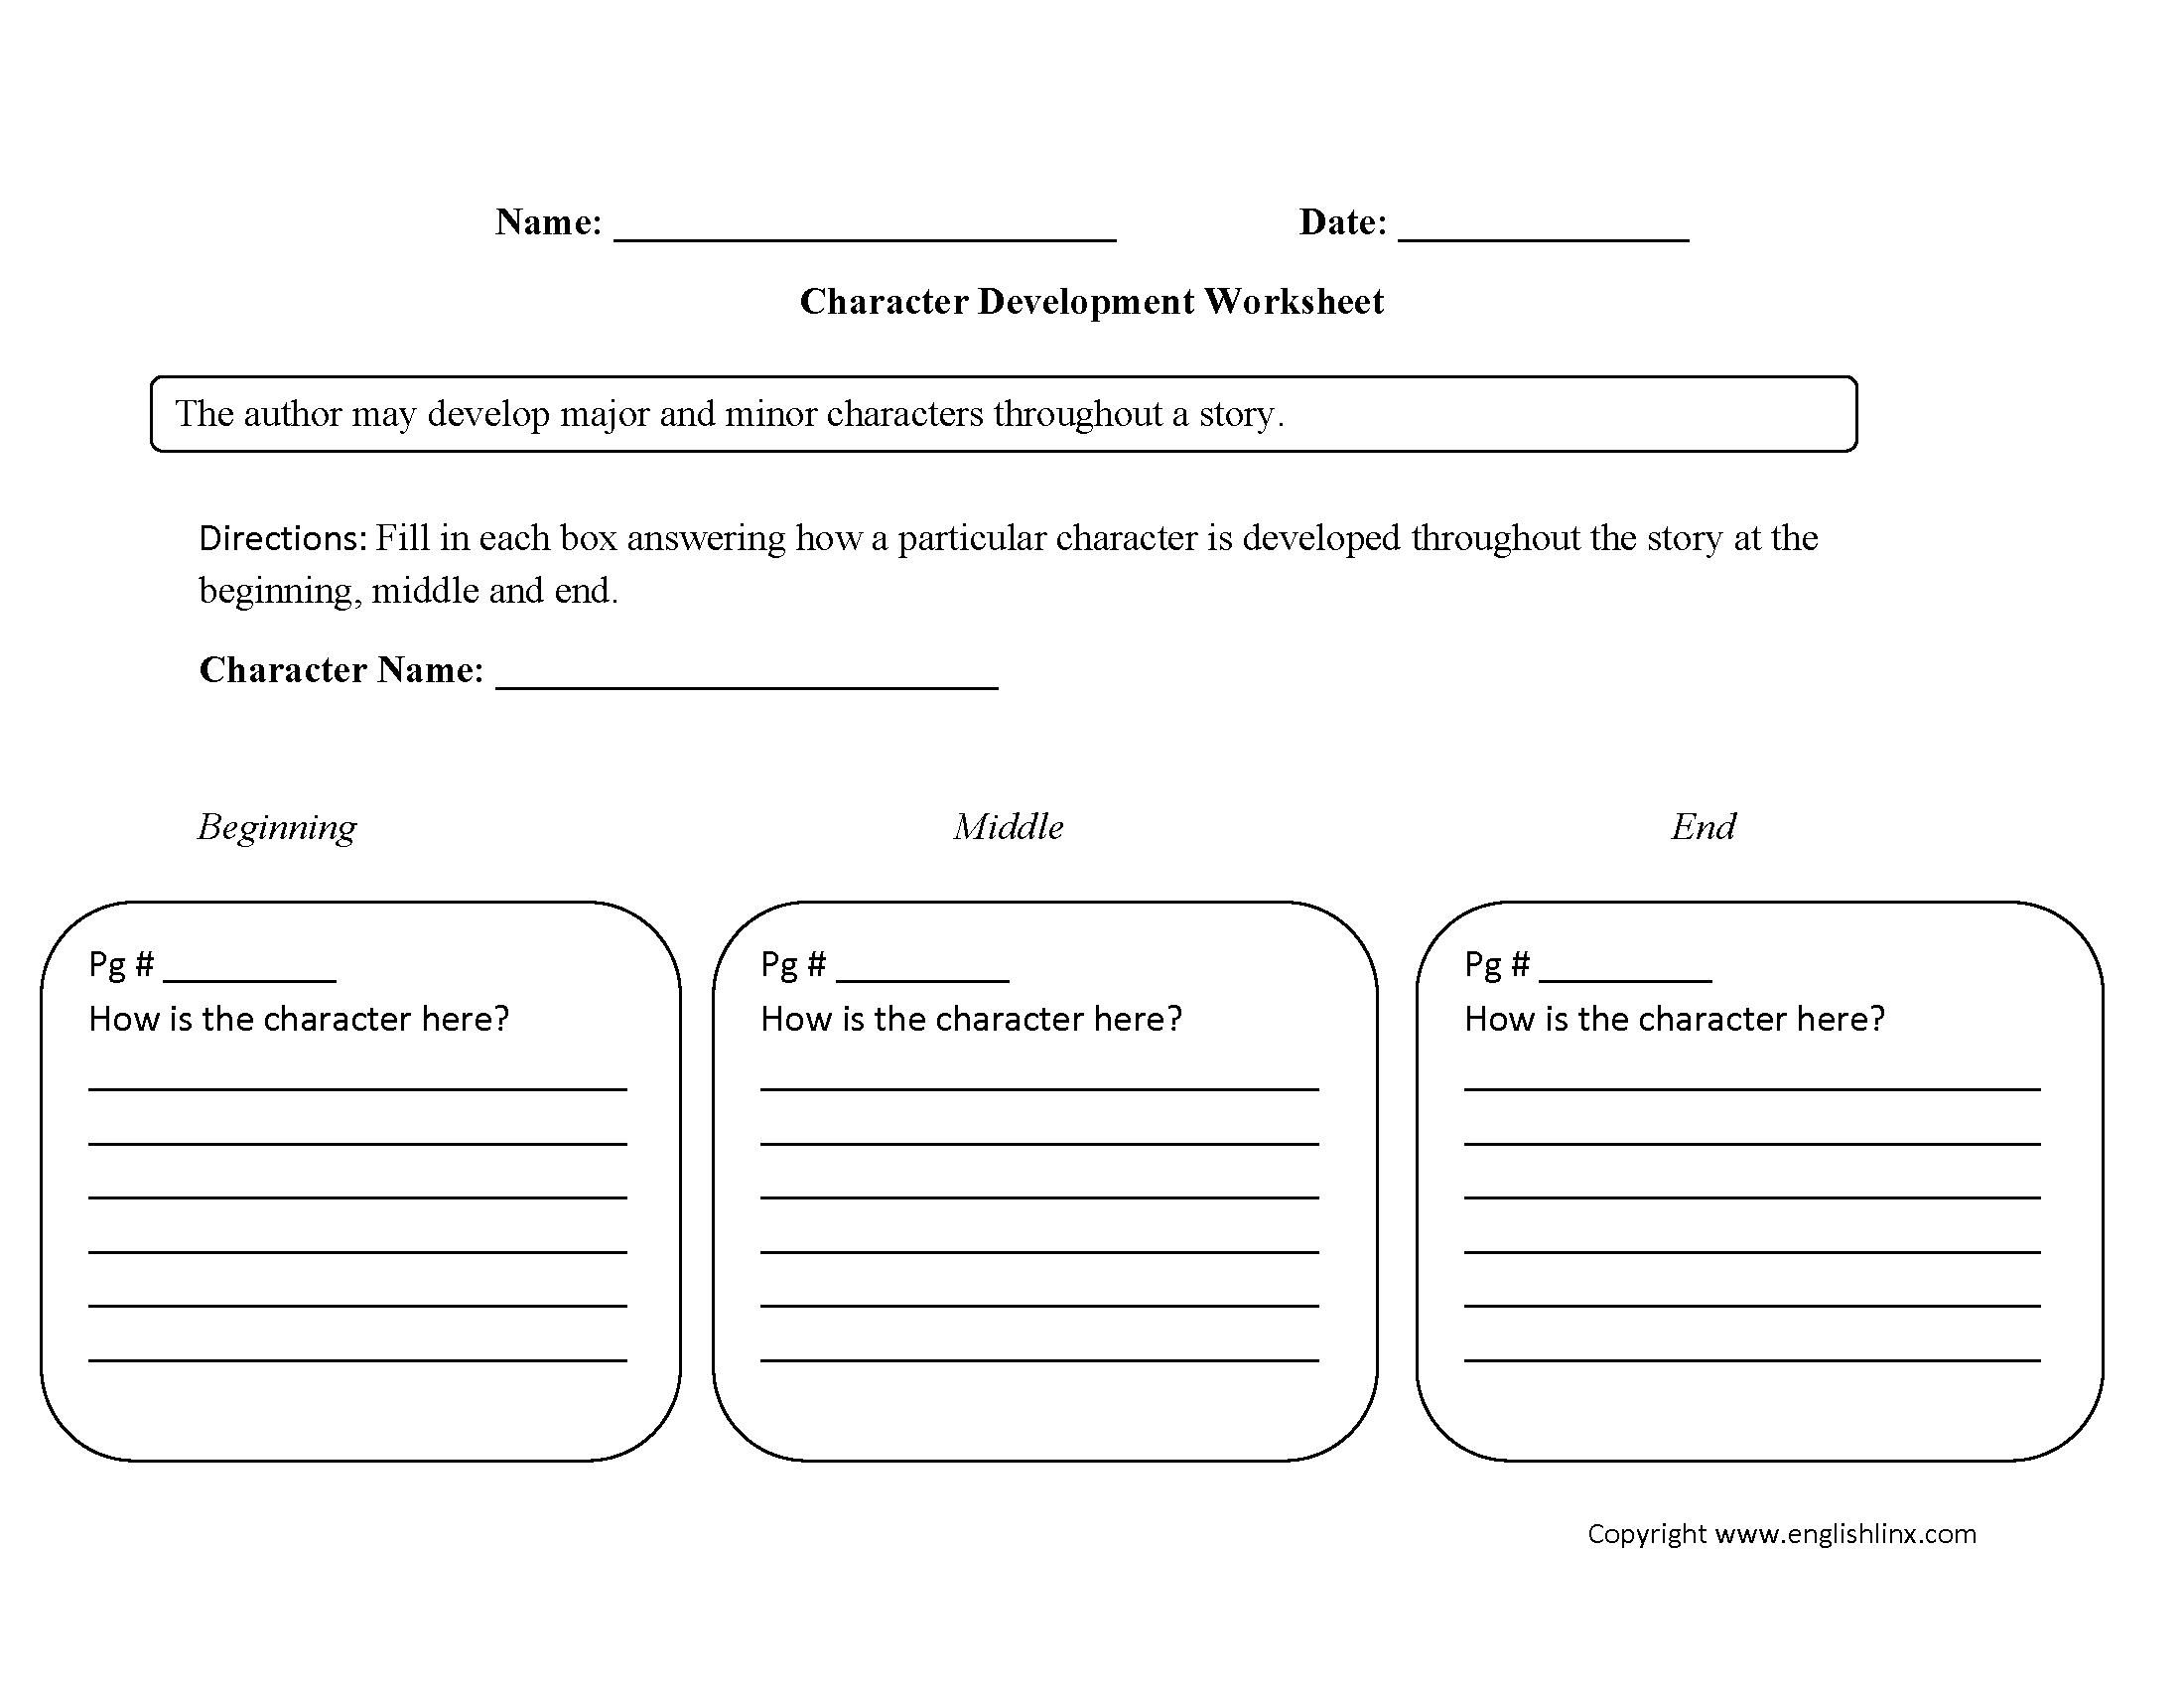 Englishlinx | Character Analysis Worksheets | Character Development Worksheet Printable